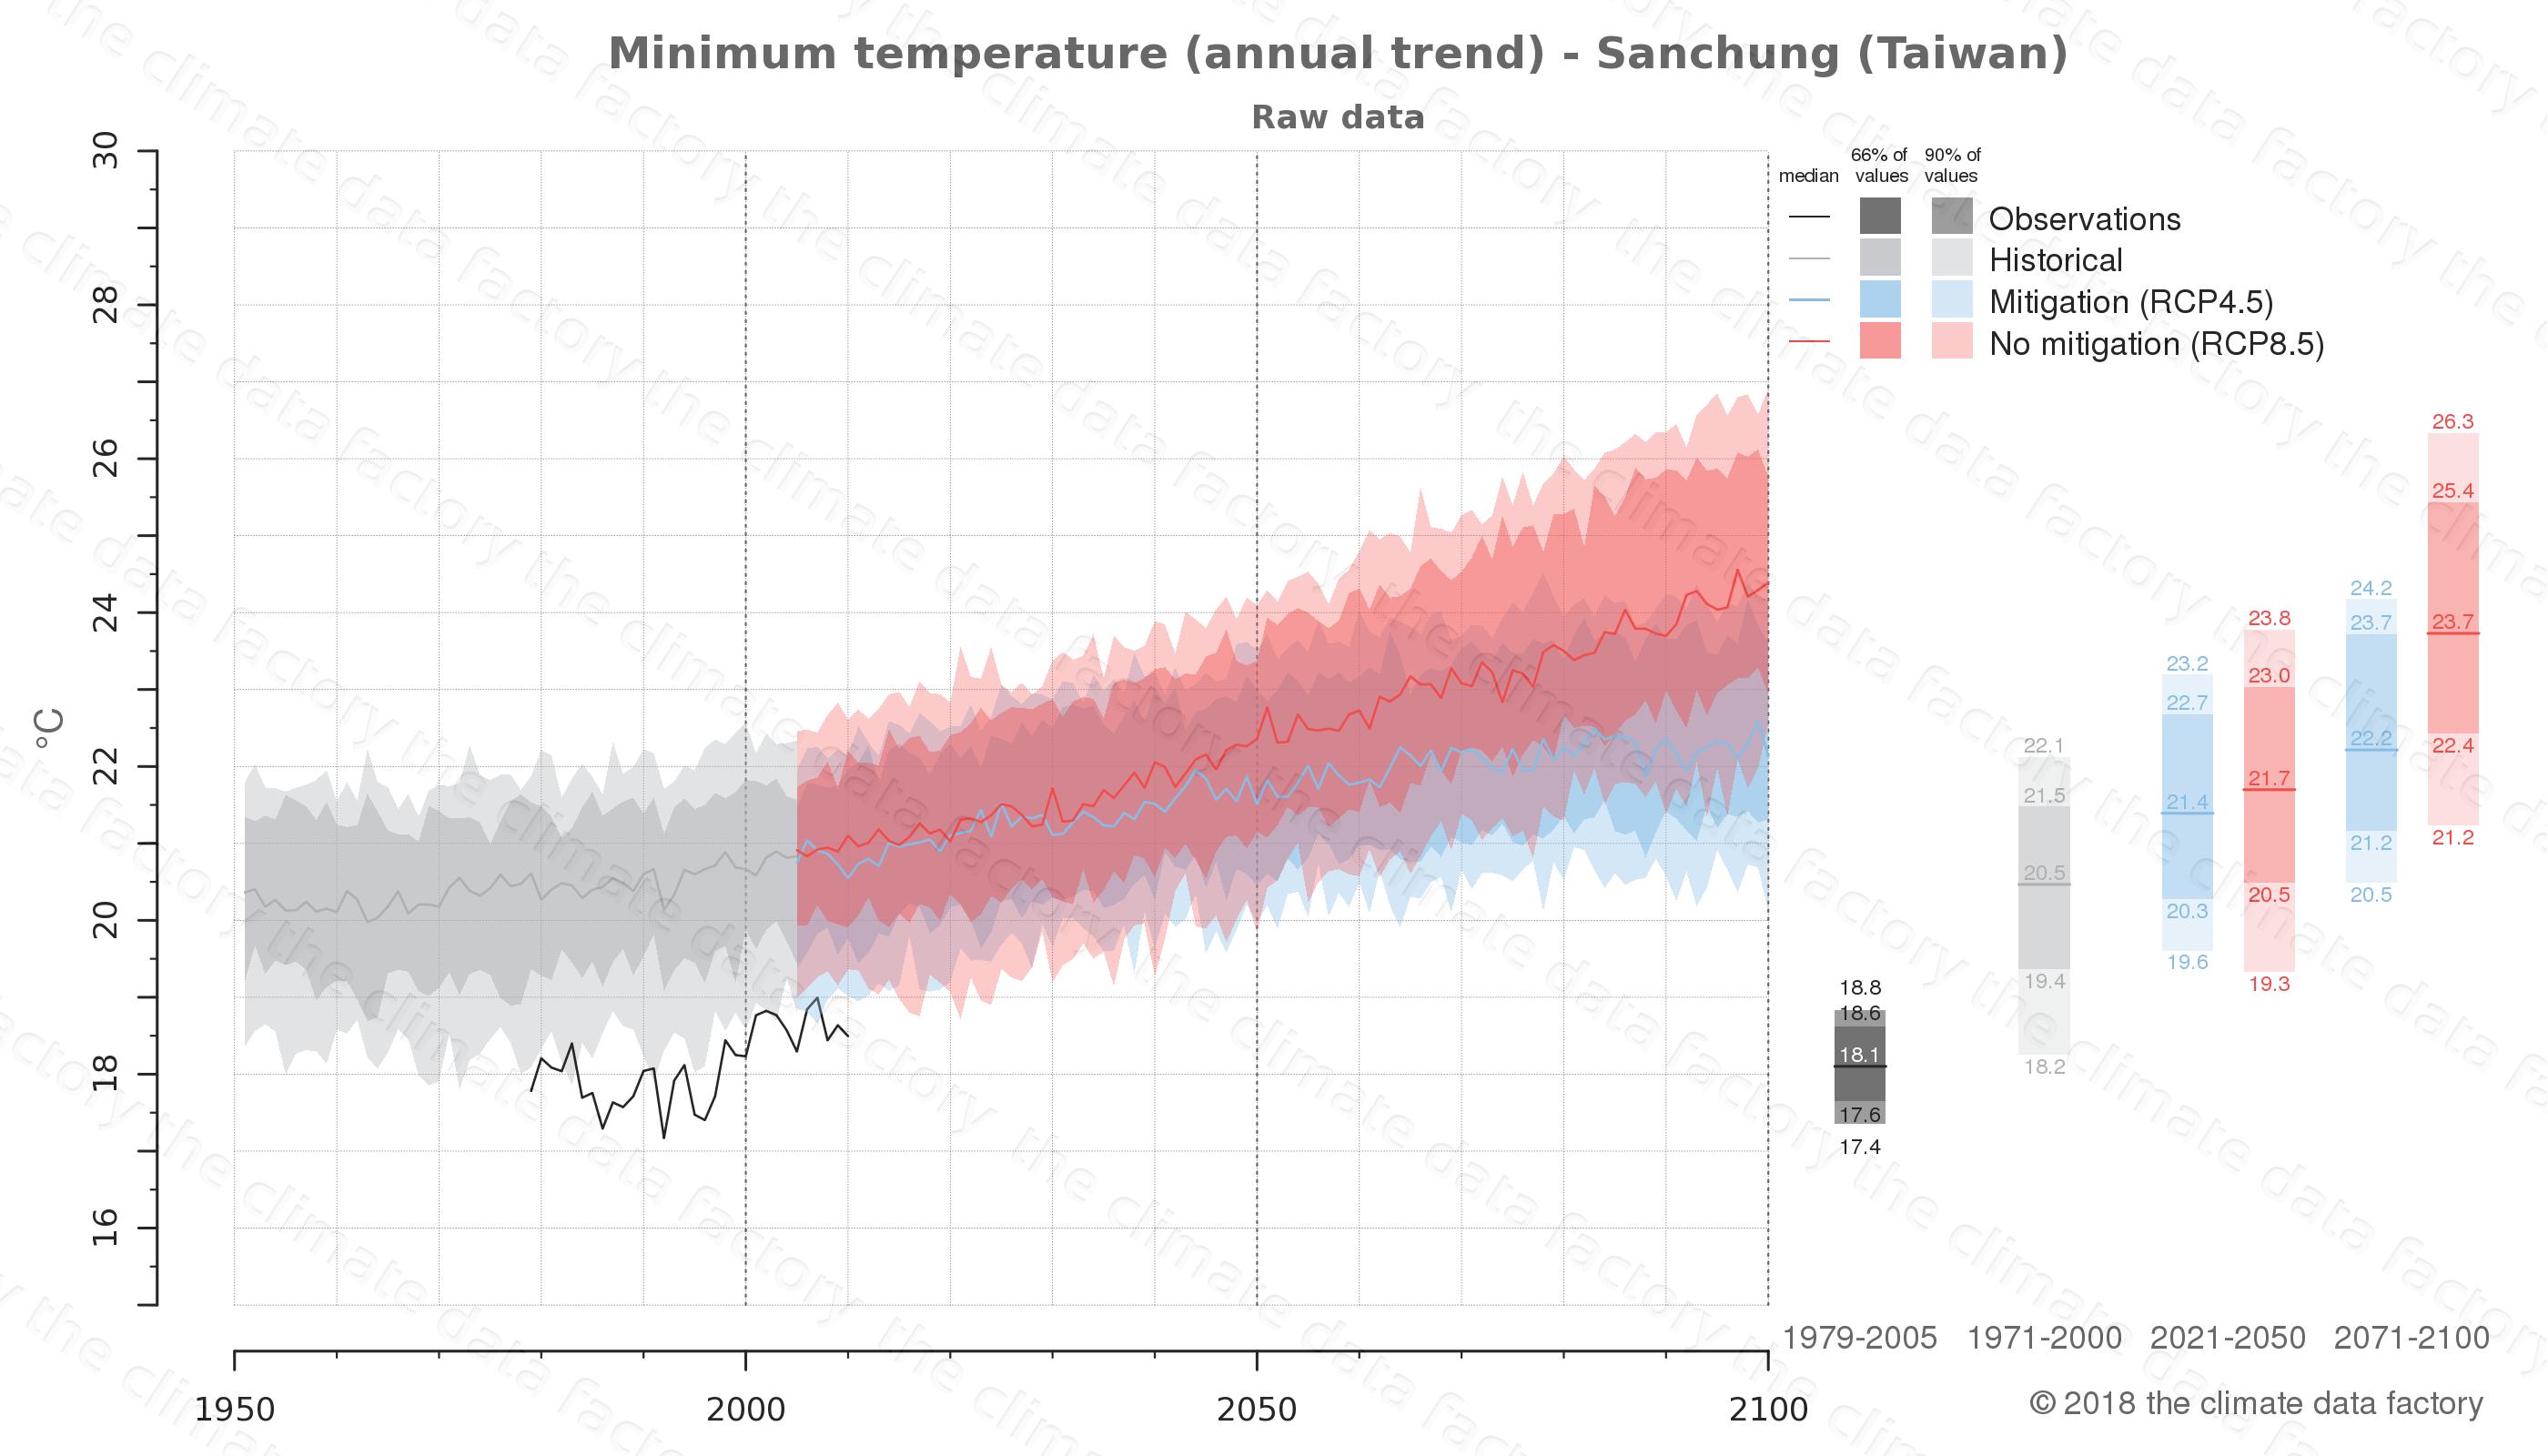 climate change data policy adaptation climate graph city data minimum-temperature sanchung taiwan